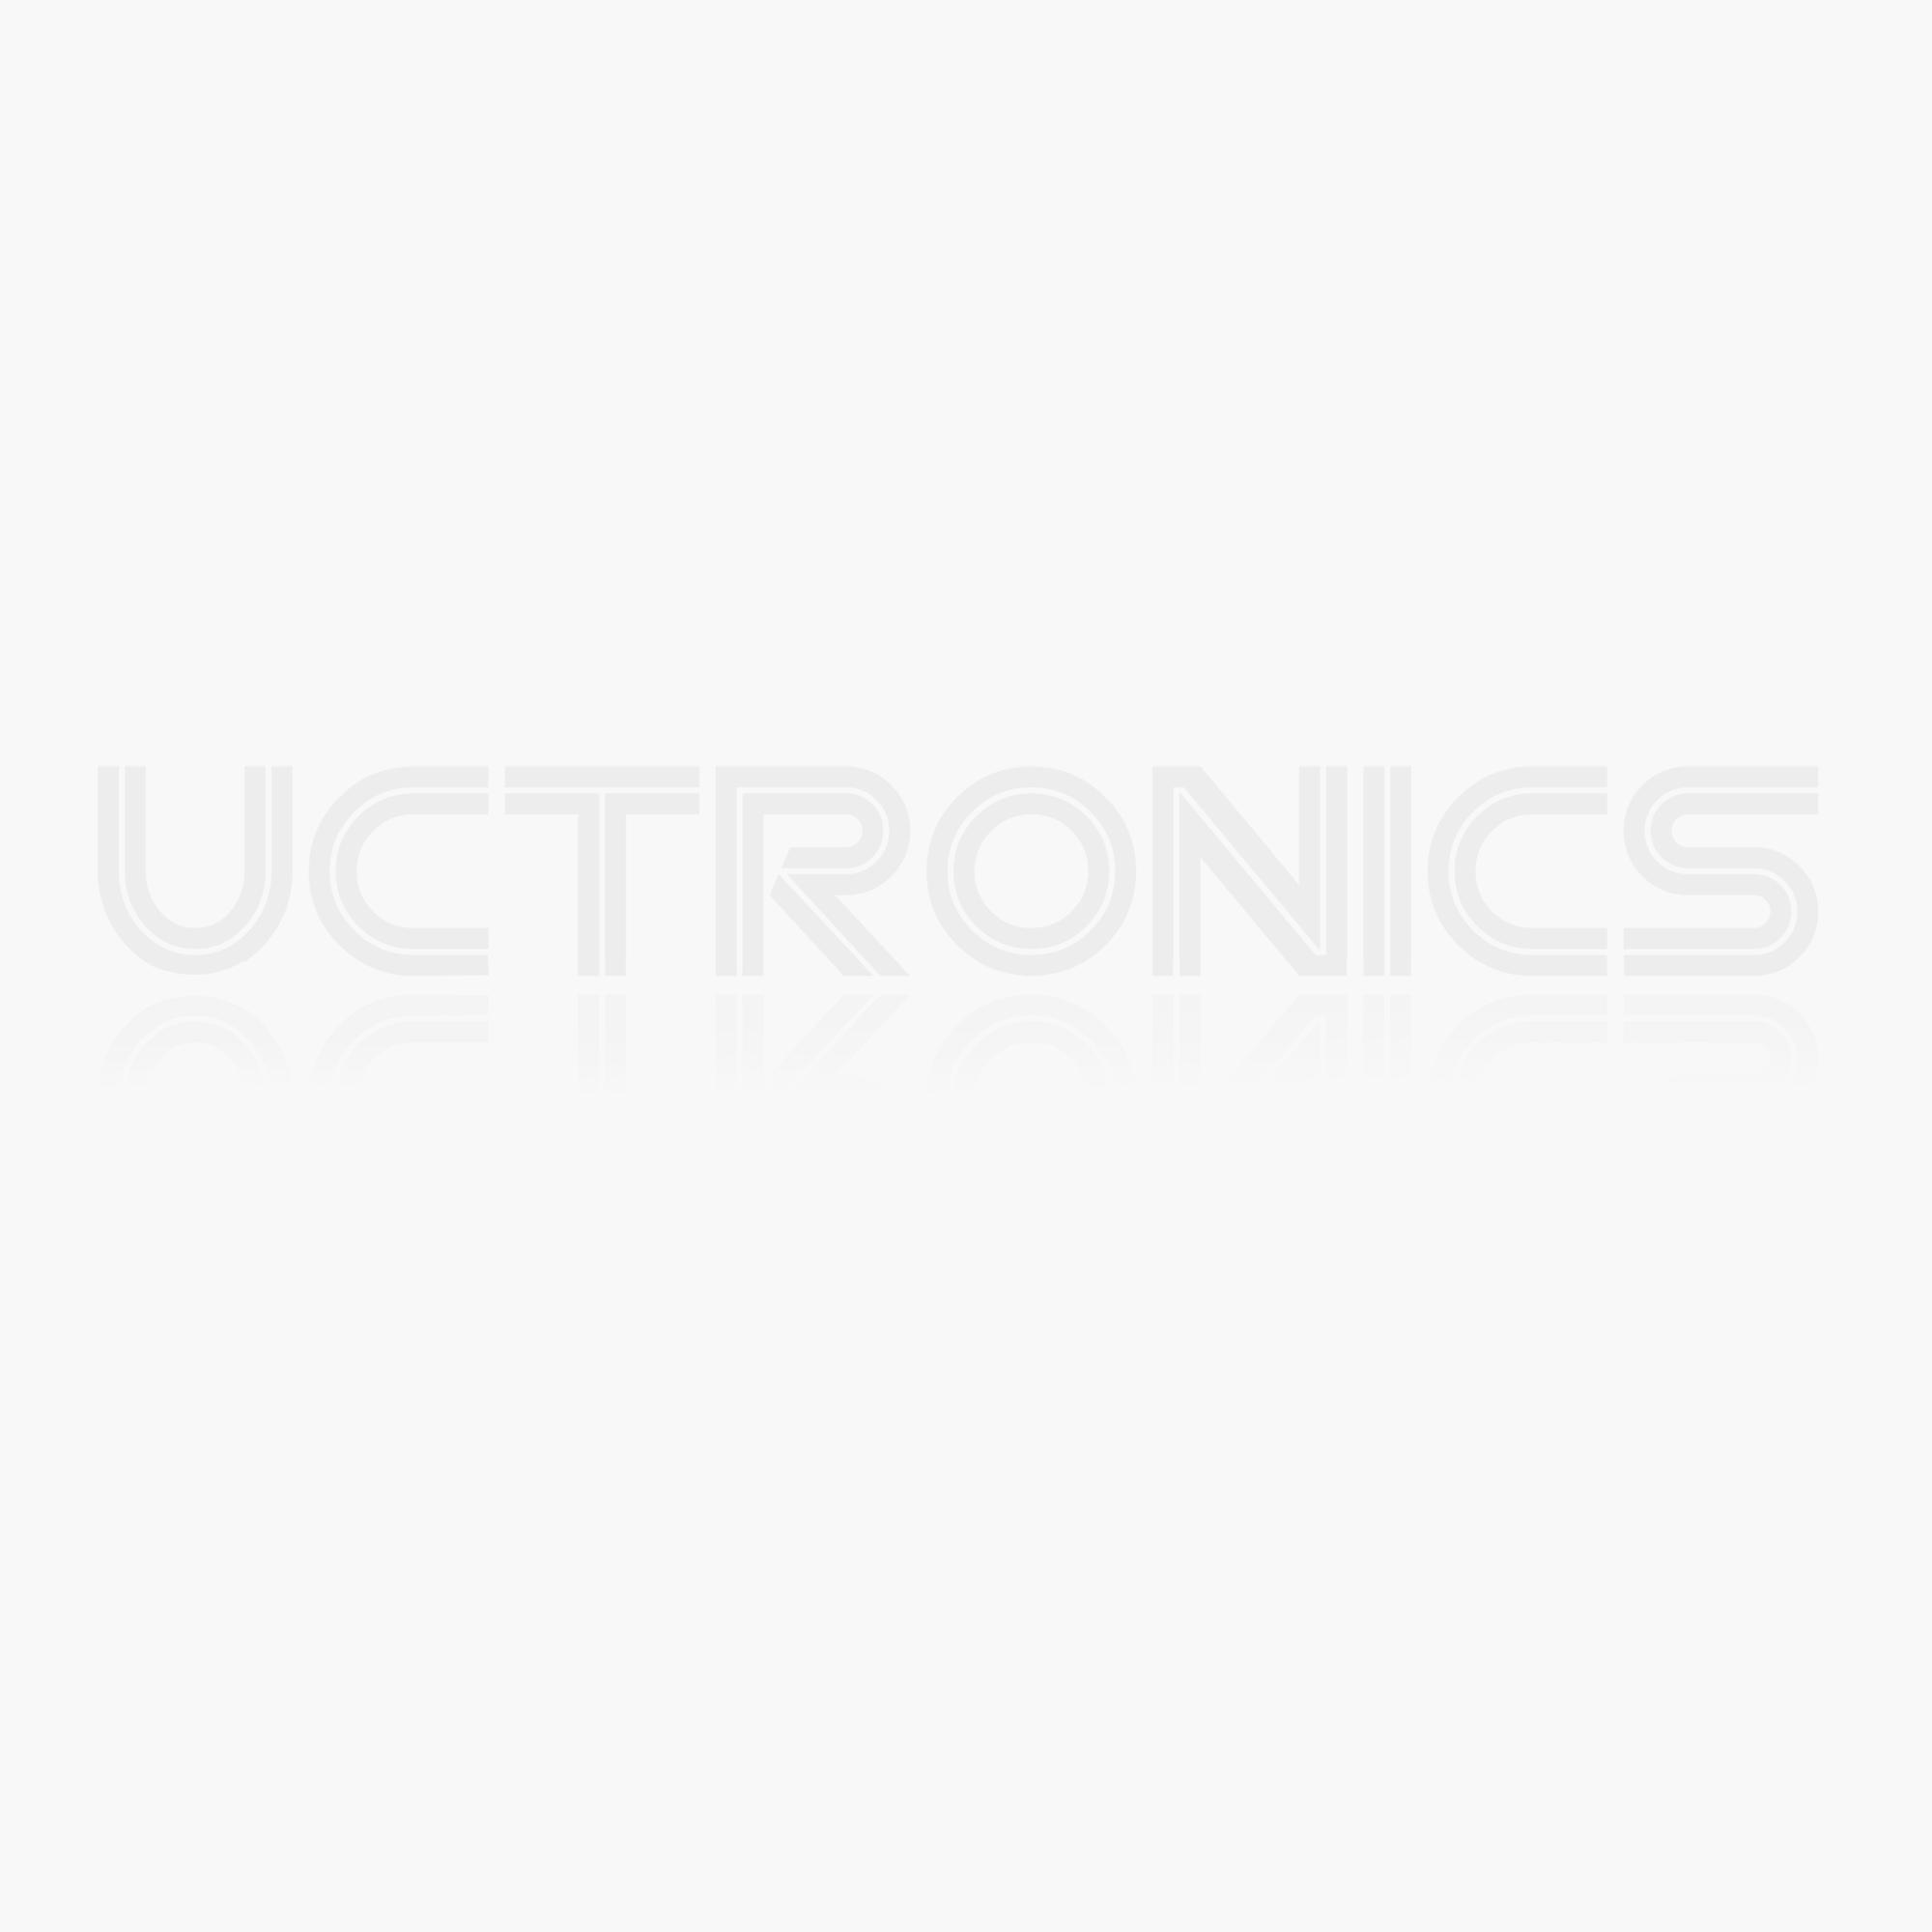 10pcs Electrolytic capacitor 100uF 16V 6.3*5mm